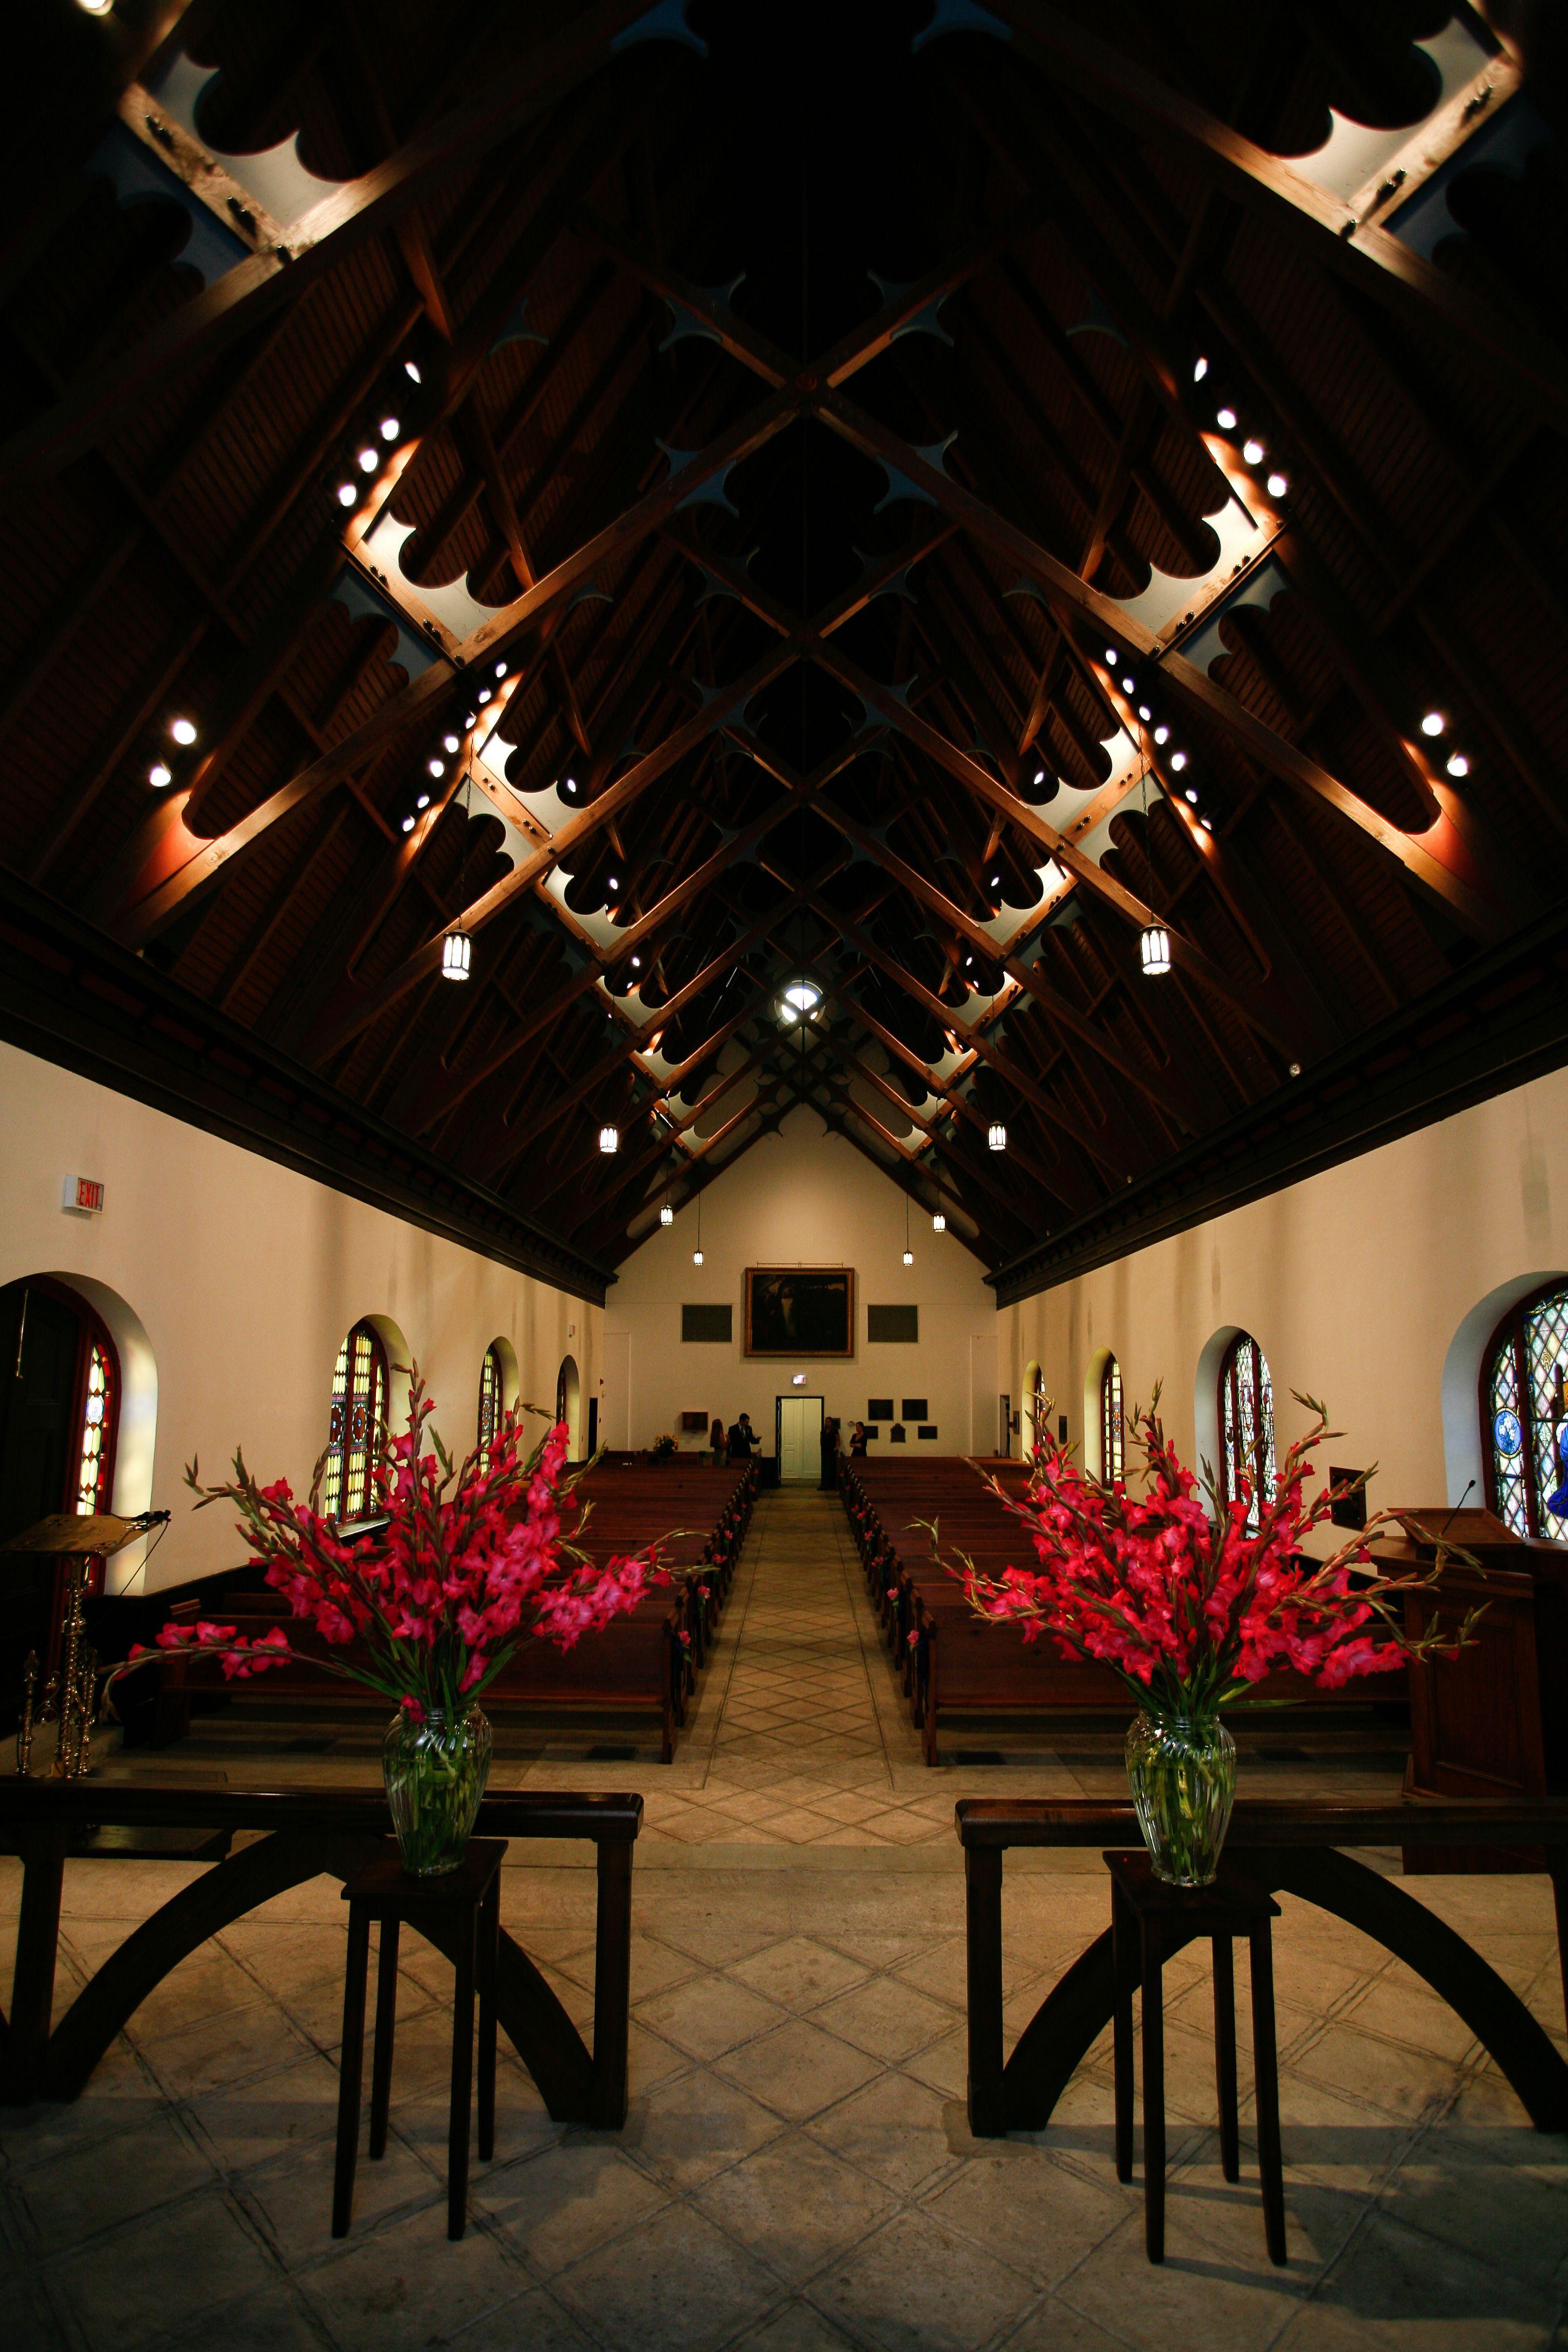 Pin By Melissa Fox On Wedding Ideas Luxury Wedding Planner Charleston Wedding Venues Blended Family Wedding